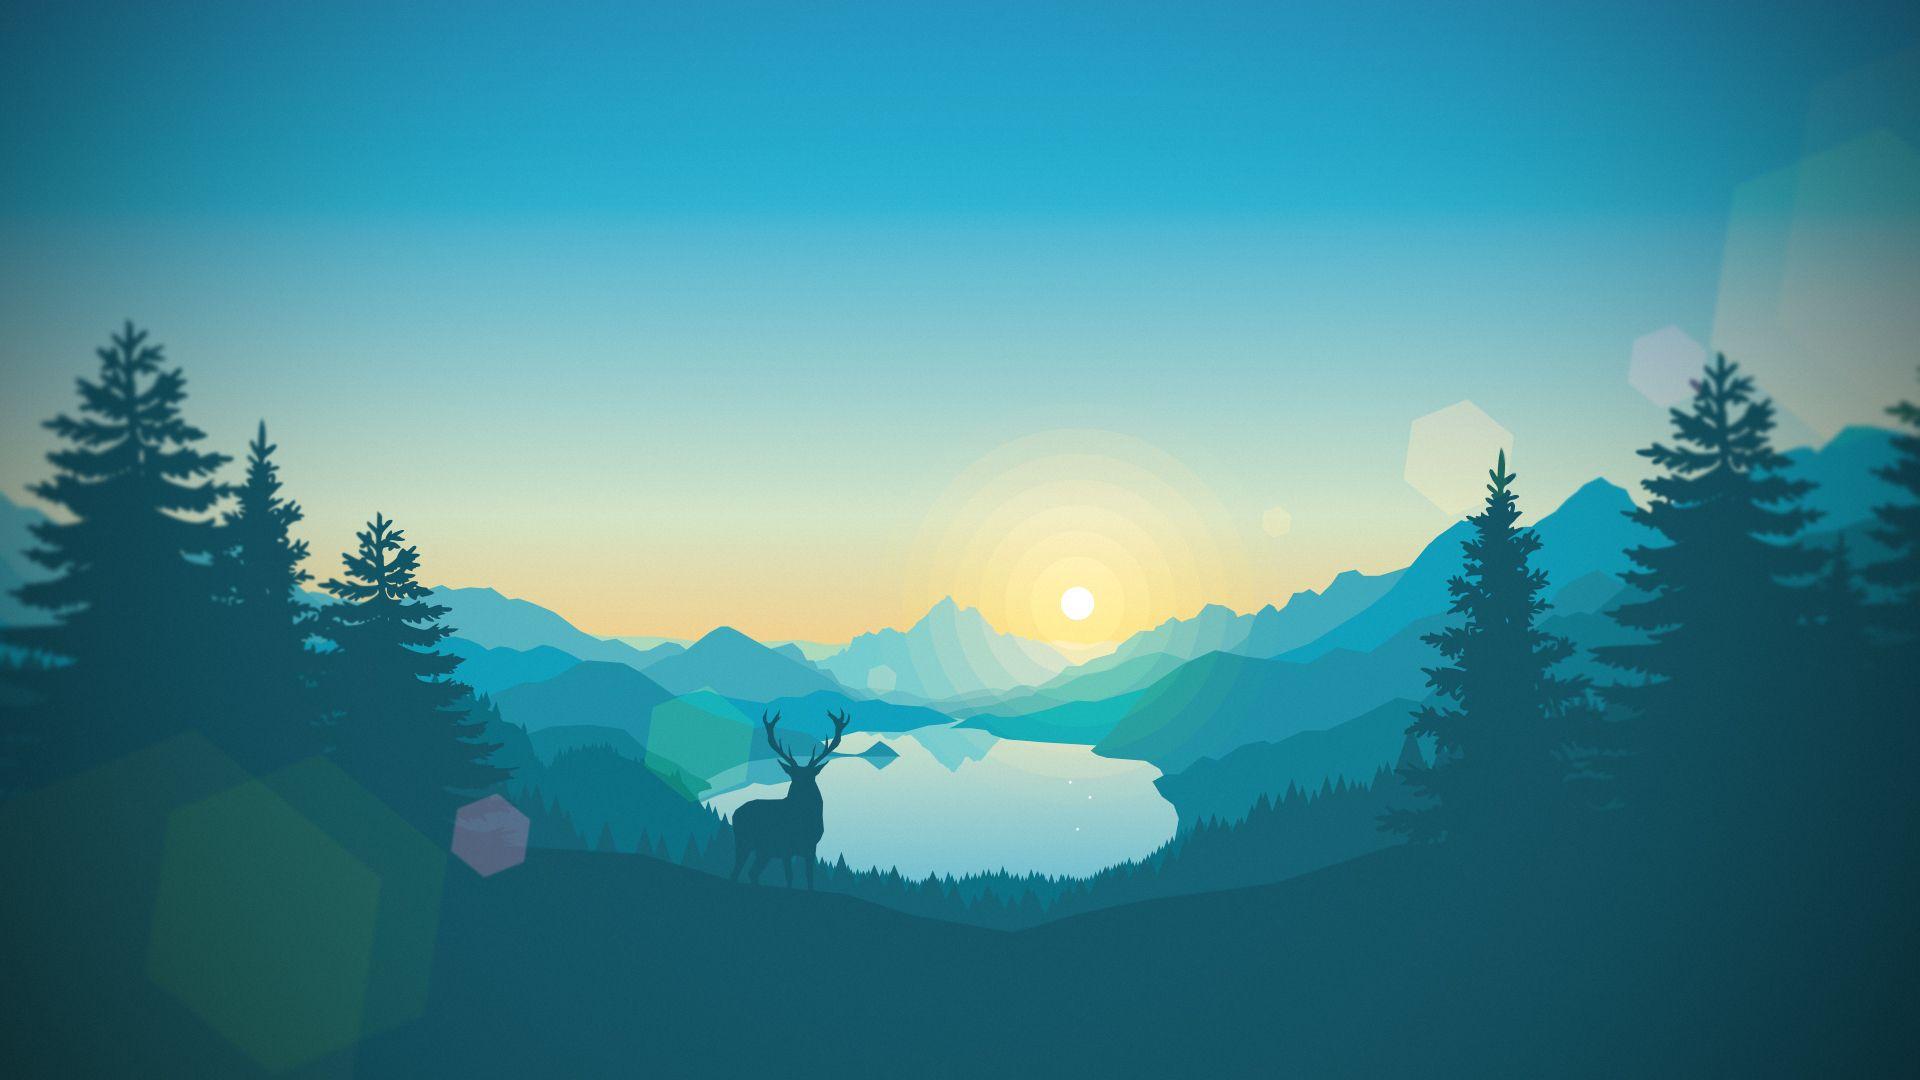 Lakeside Sunrise. [1920x1080] Landscape wallpaper